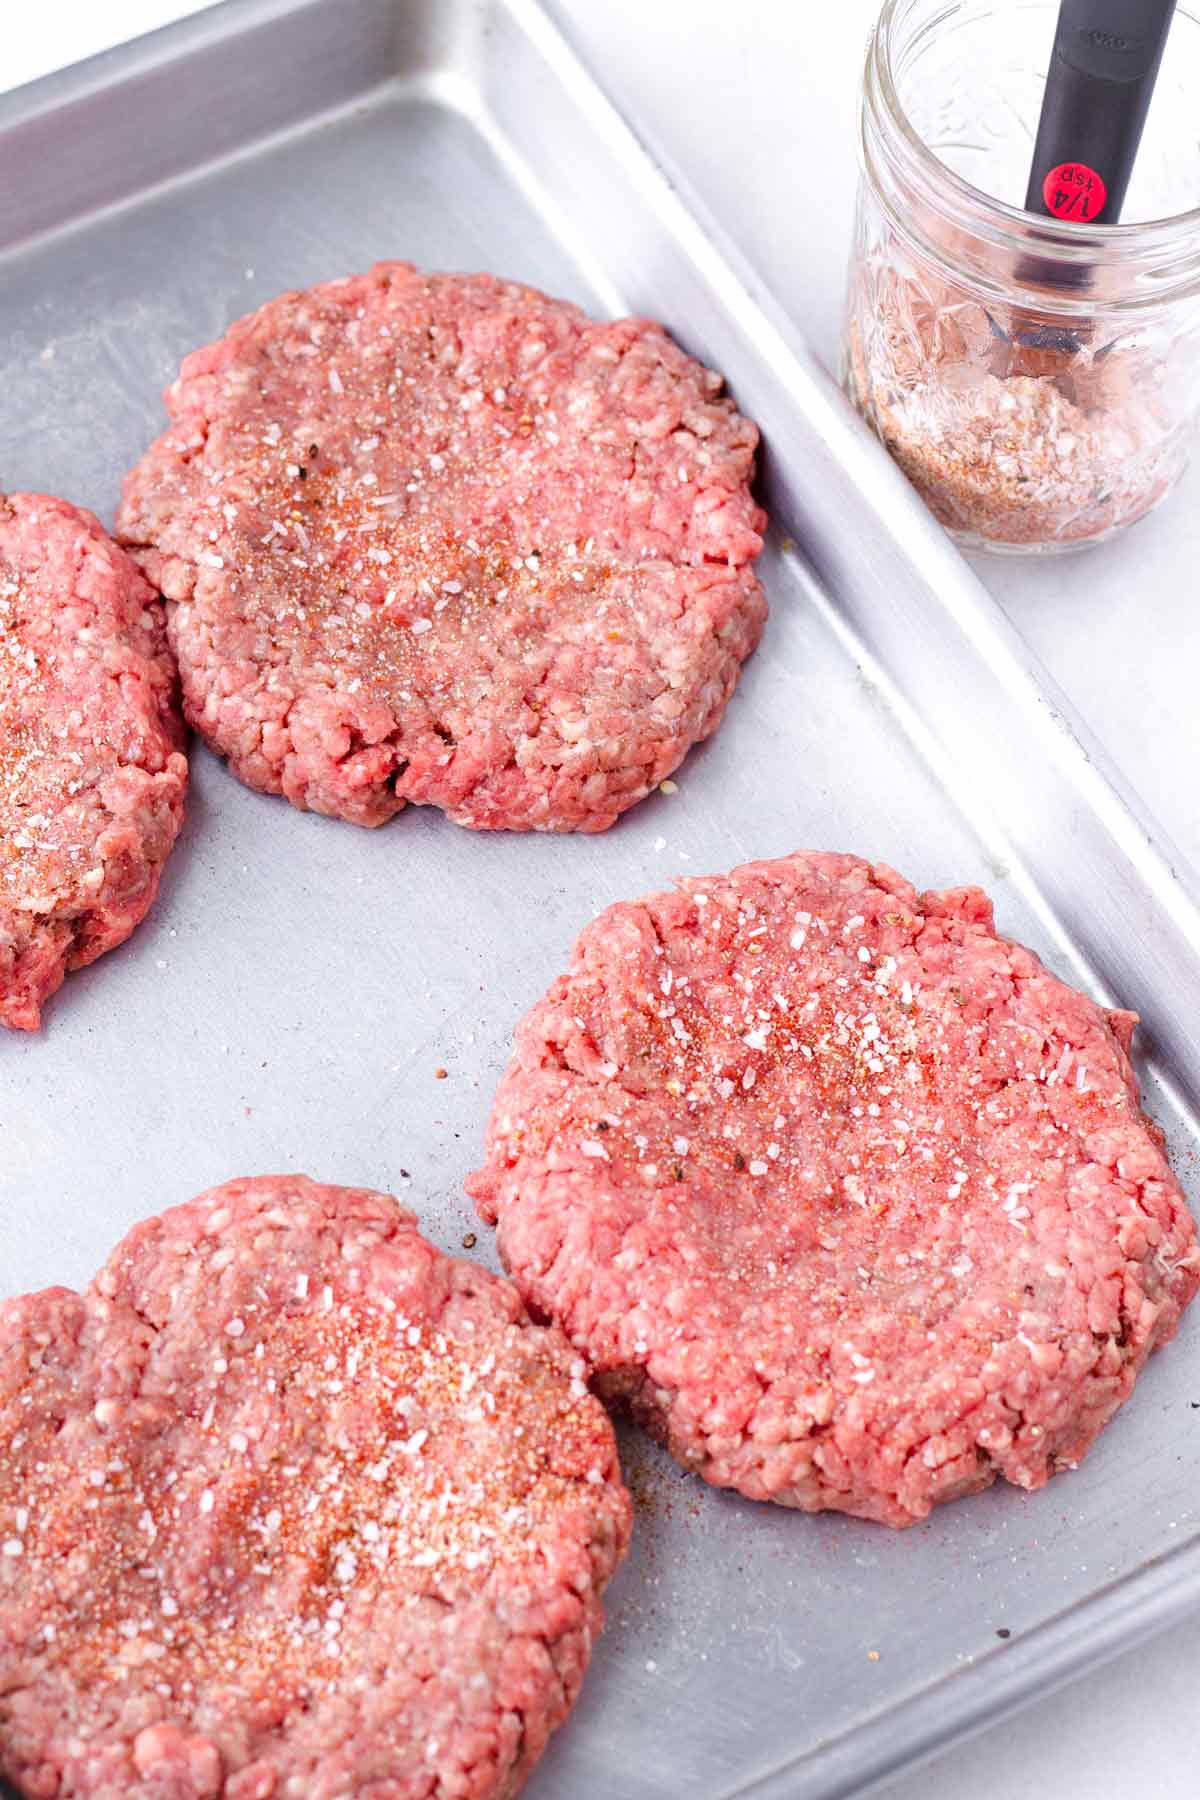 four seasoned meat patties on a sheet pan, next to a mason jar with seasoning